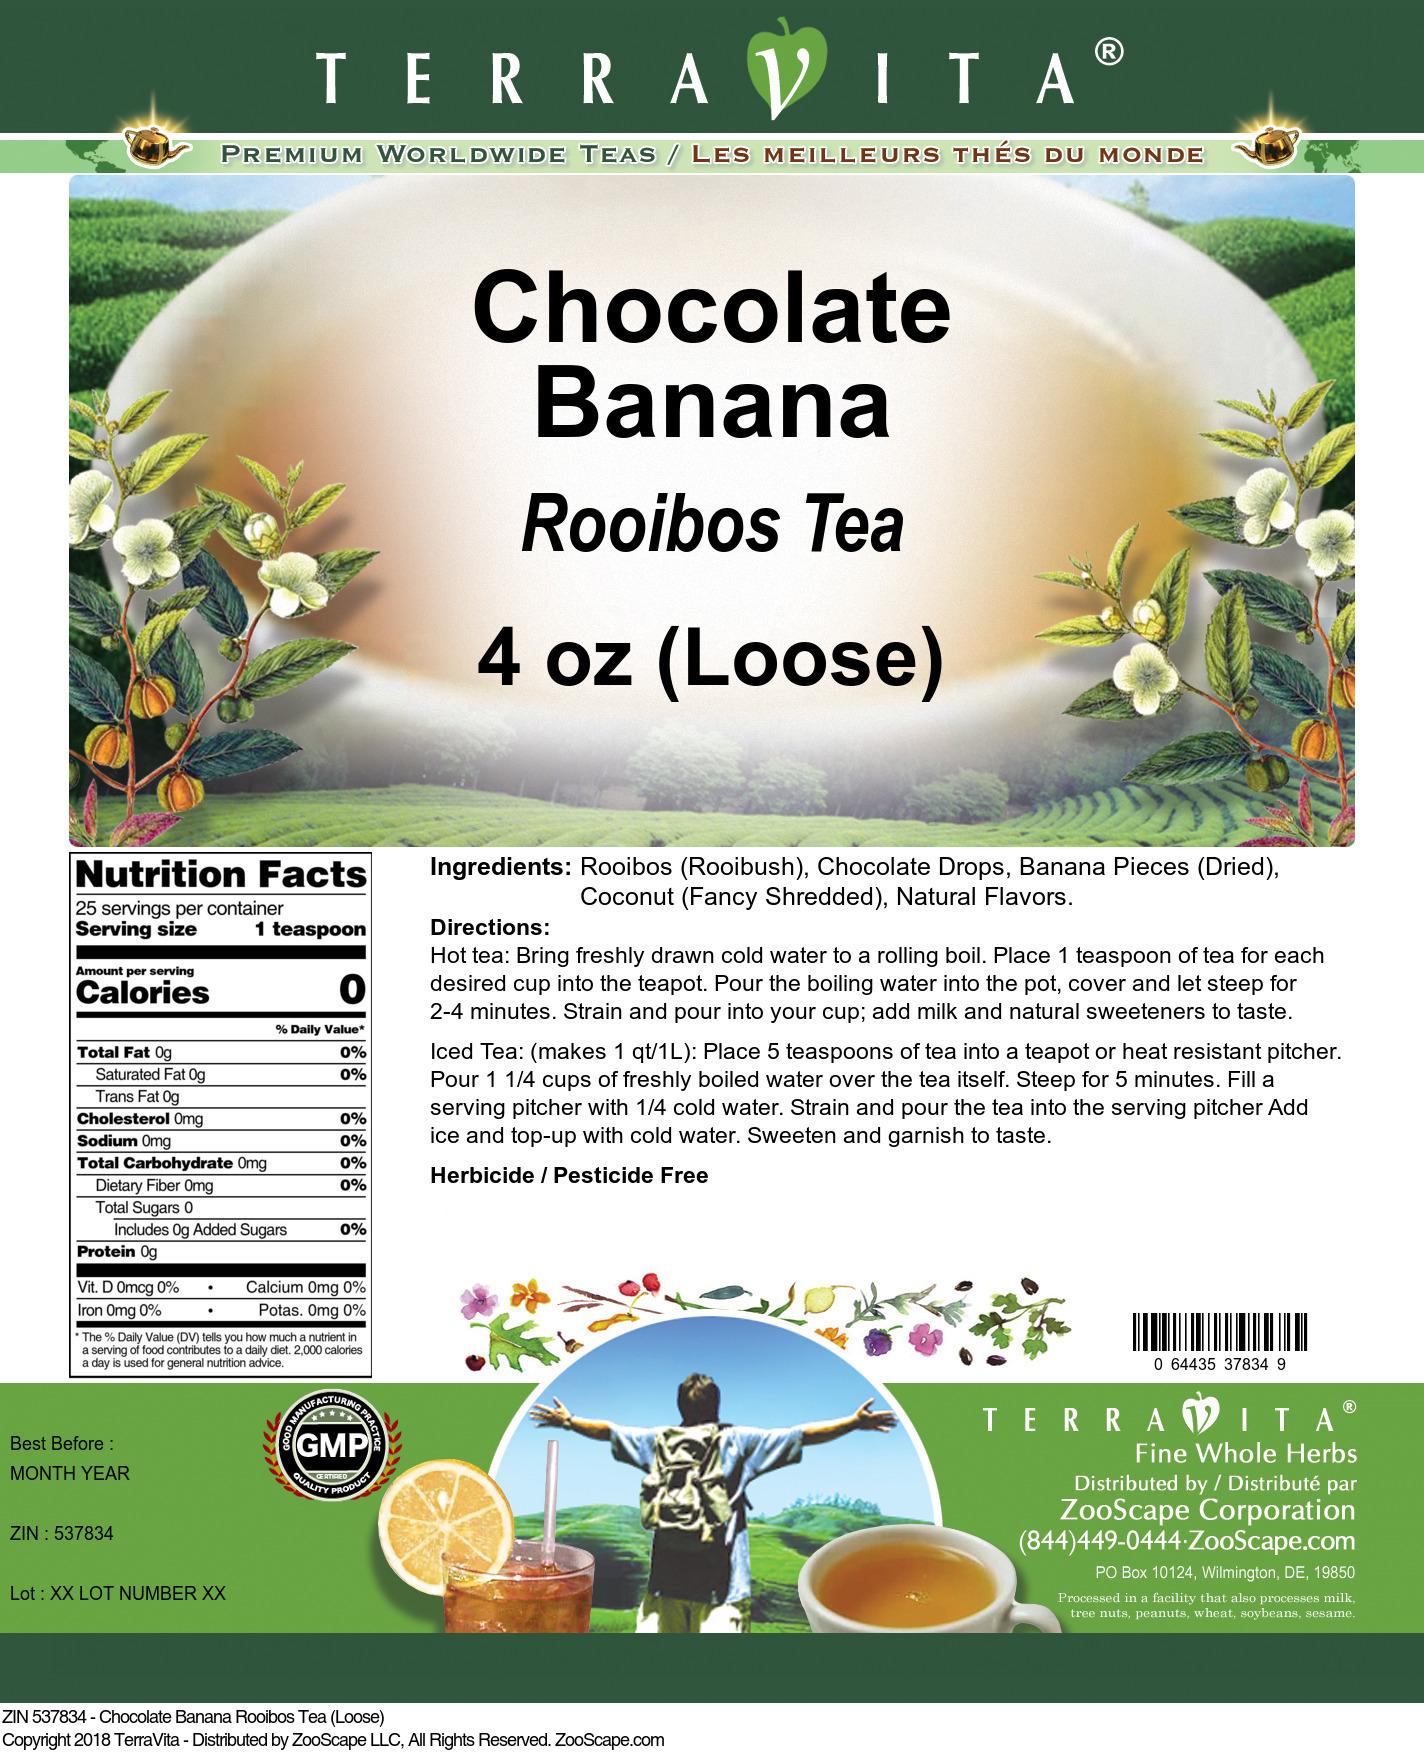 Chocolate Banana Rooibos Tea (Loose)